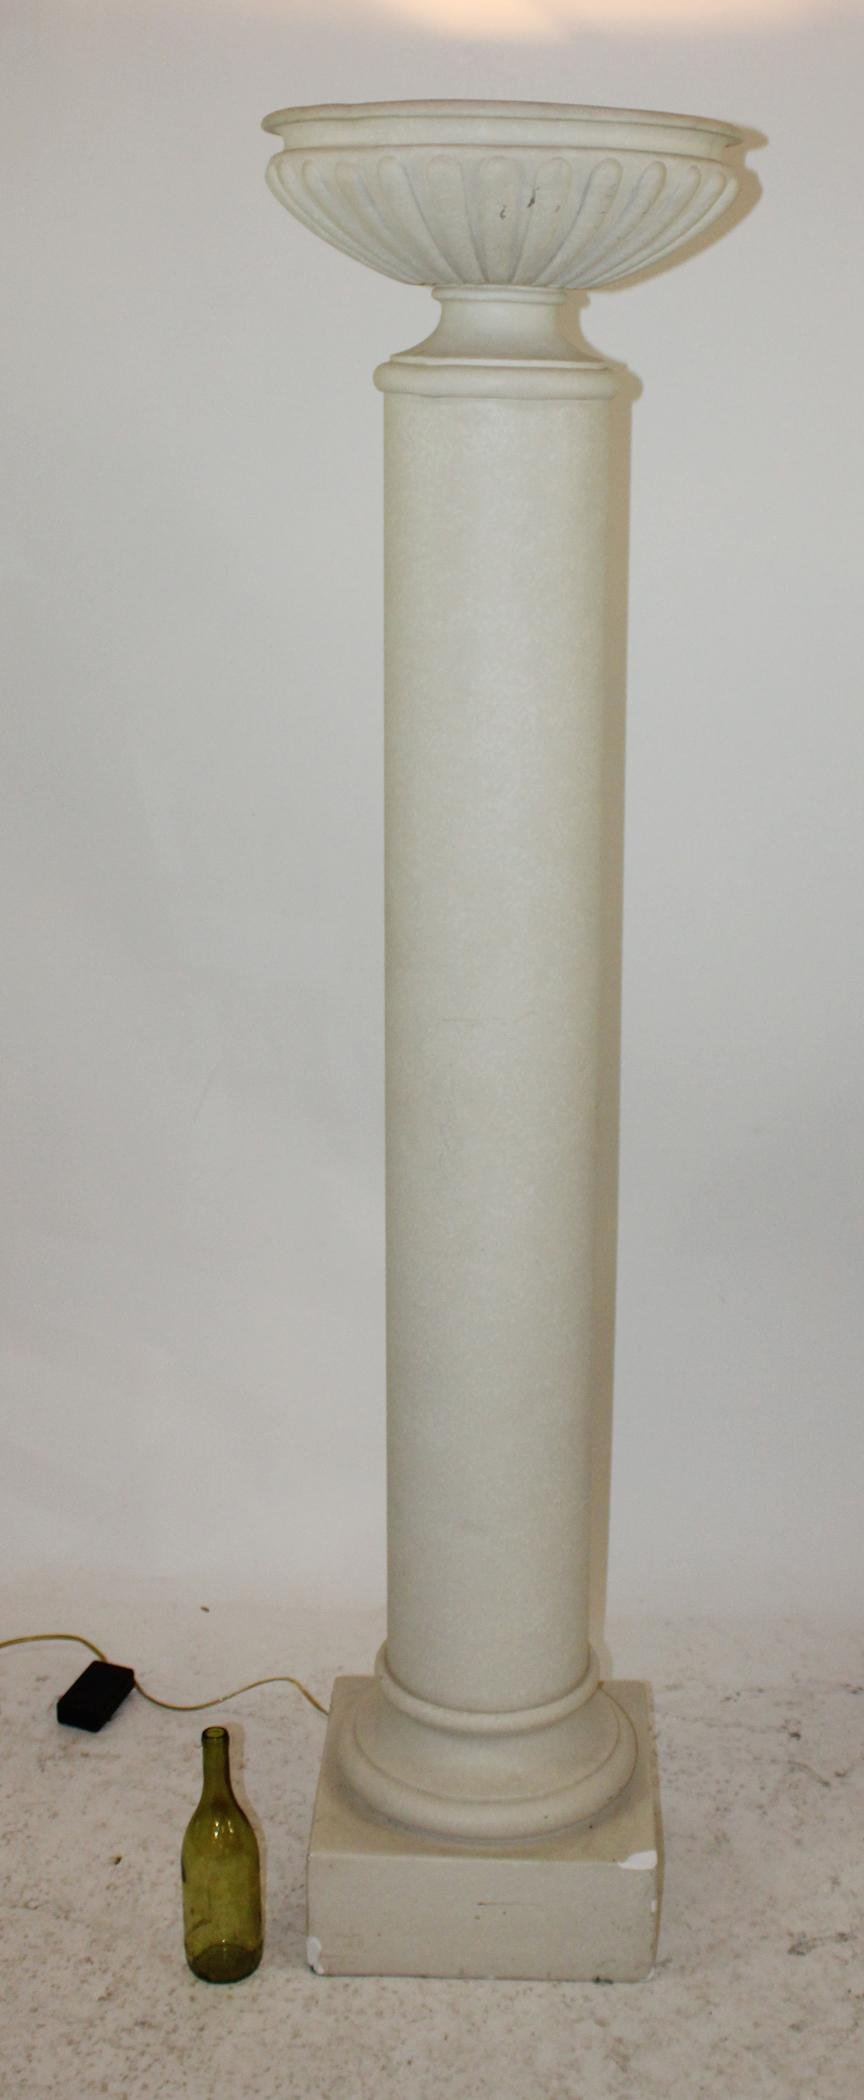 Cast column form torchere floor lamp